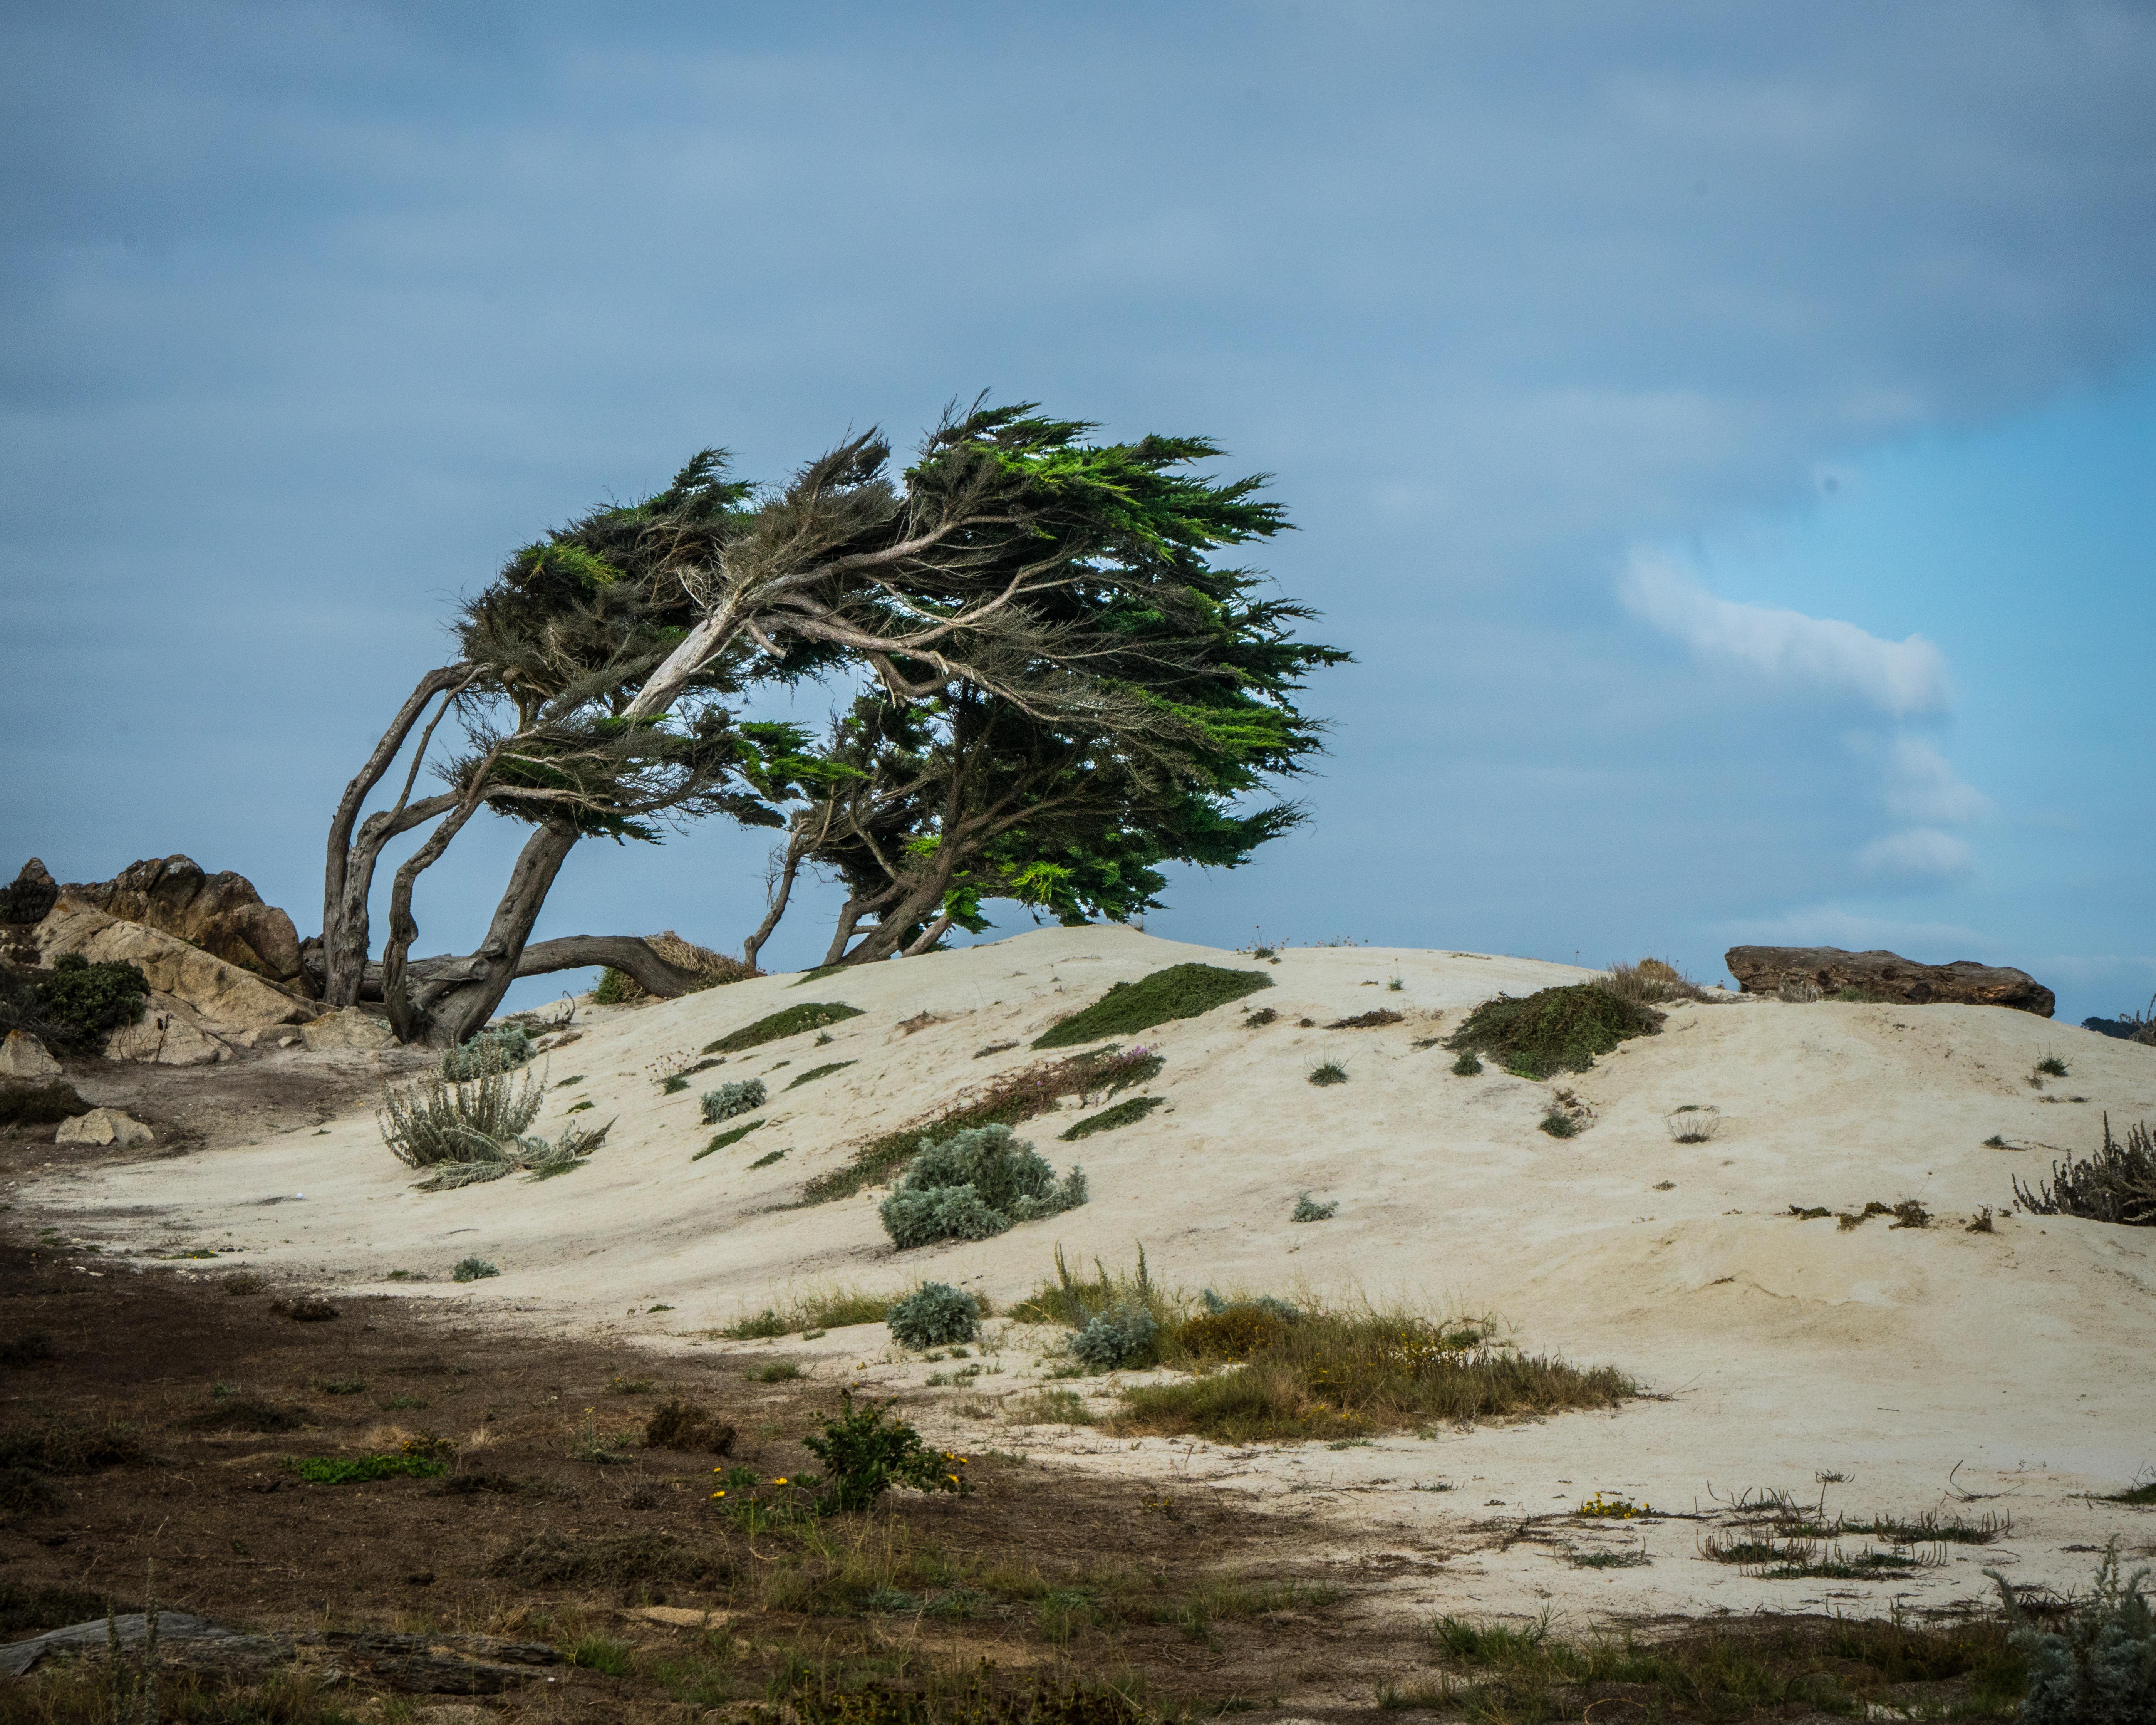 #cypress, #dune, #wind, #clouds, #coast, #maonterey, #golf, #nature, #landscape